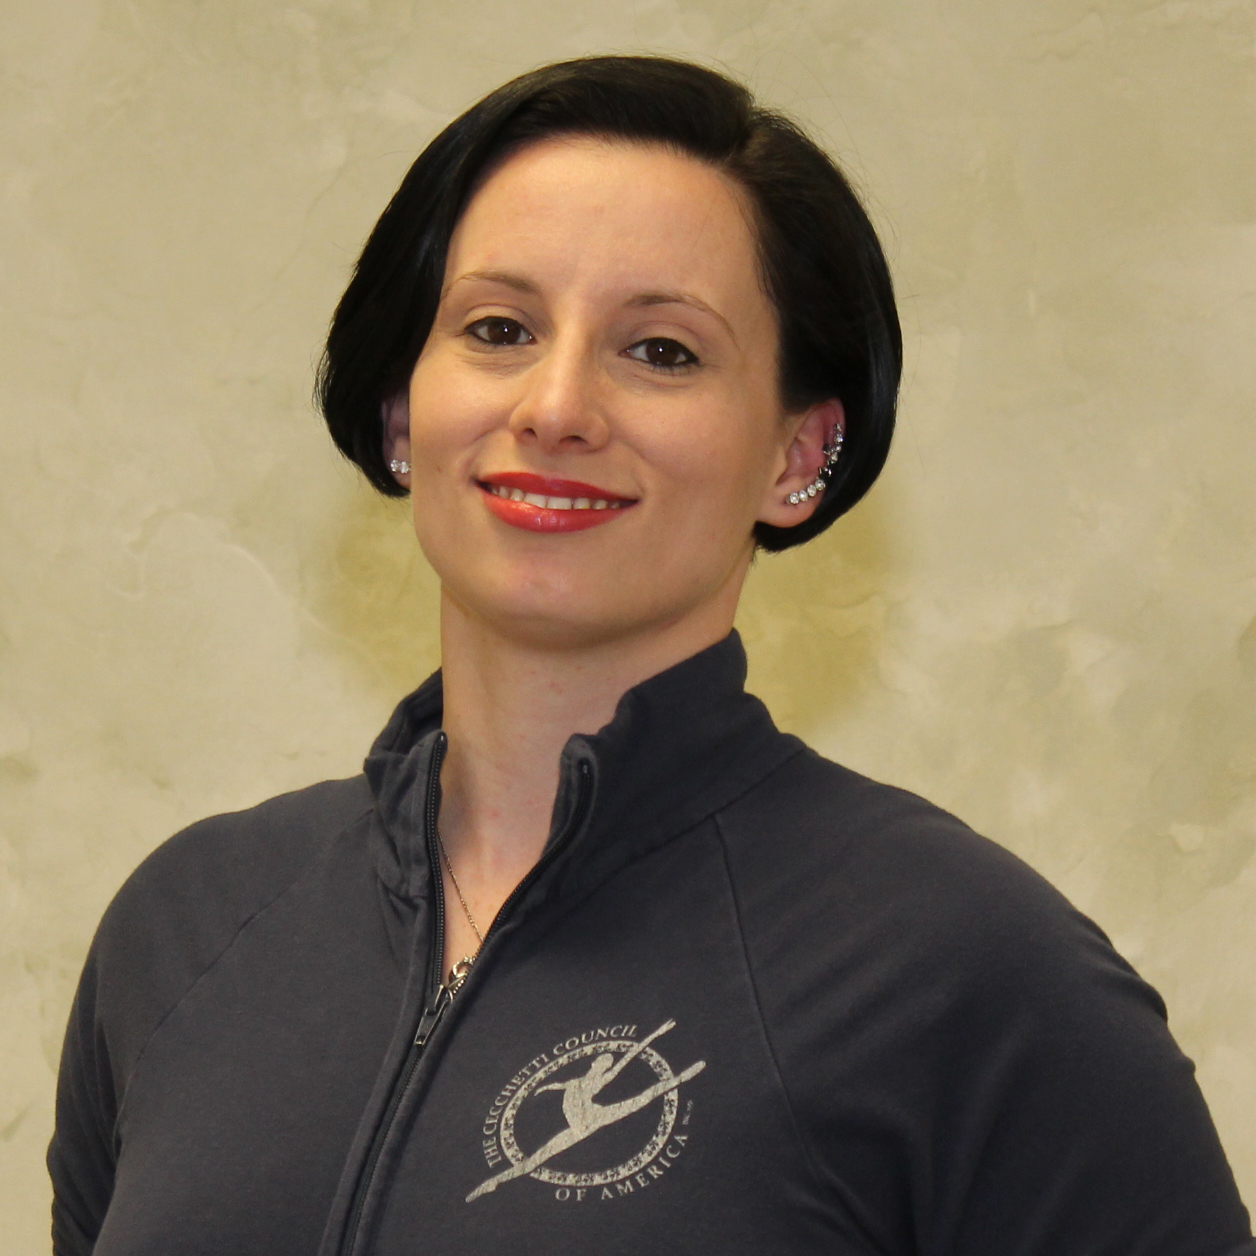 Dana Cochren